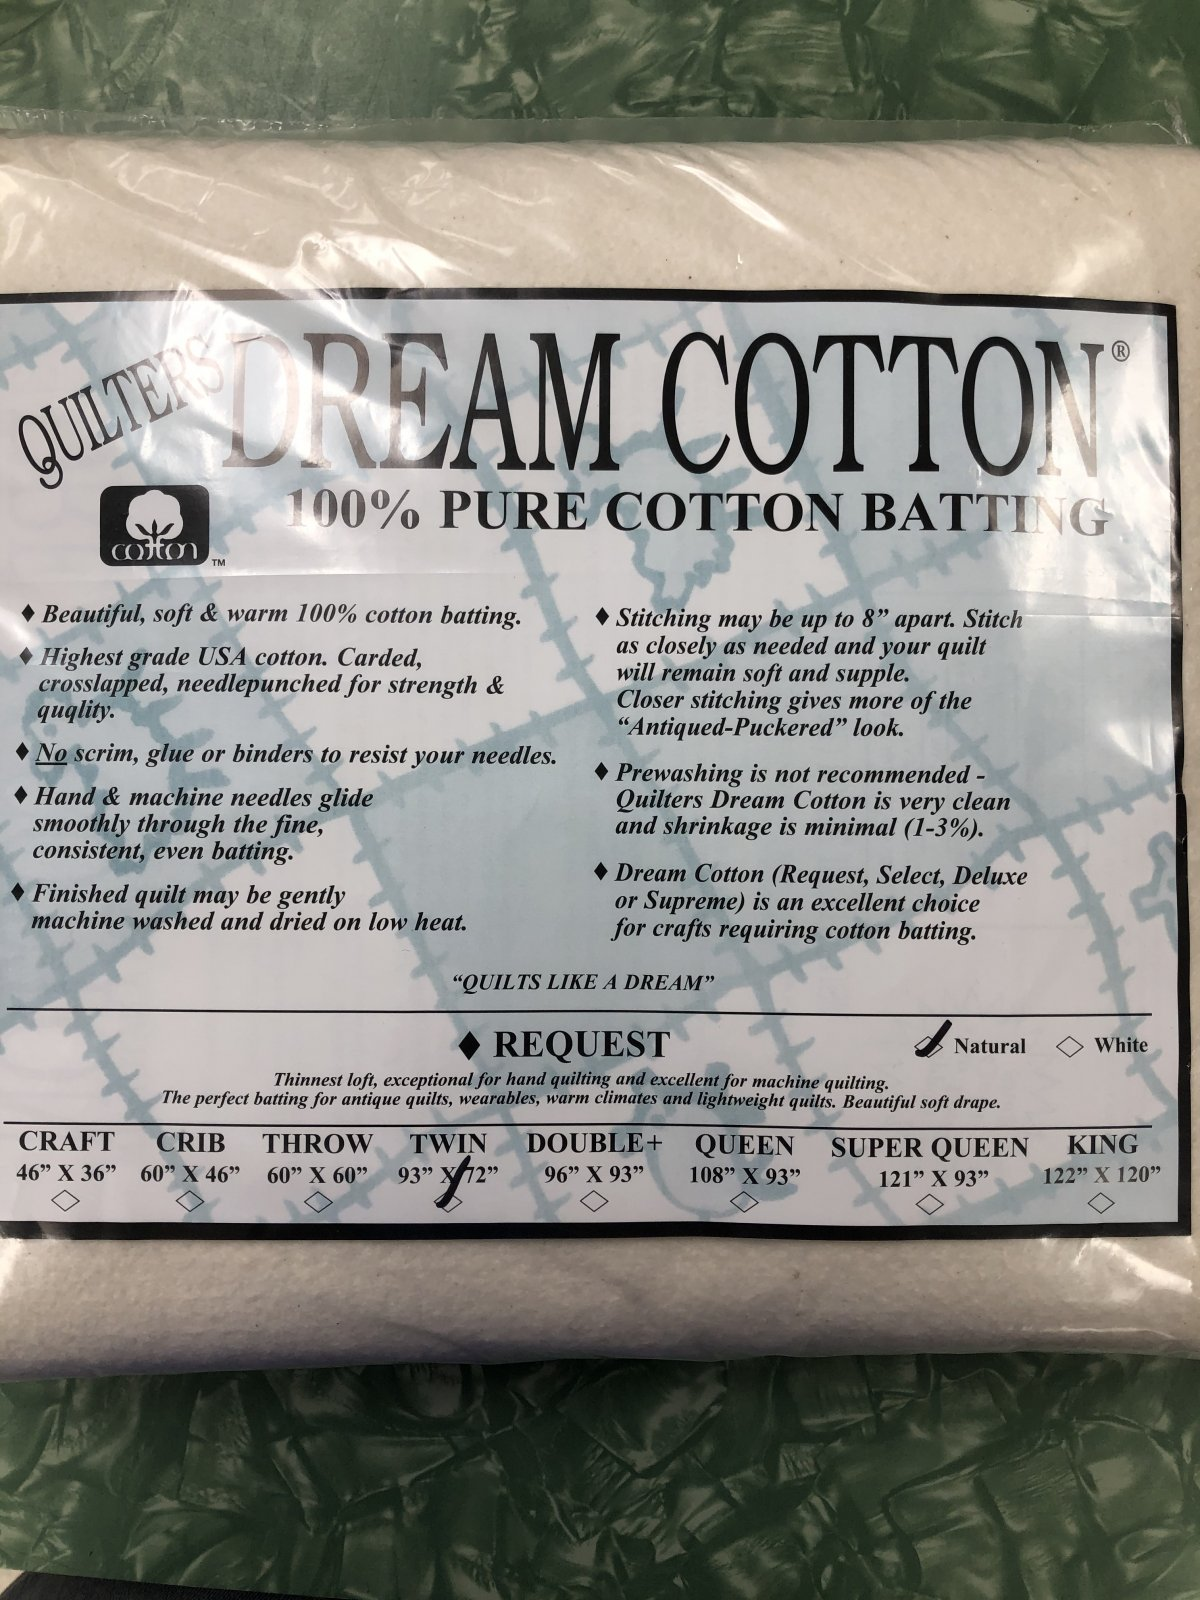 Natural Dream Cotton Request Twin Thinnest Loft Natural